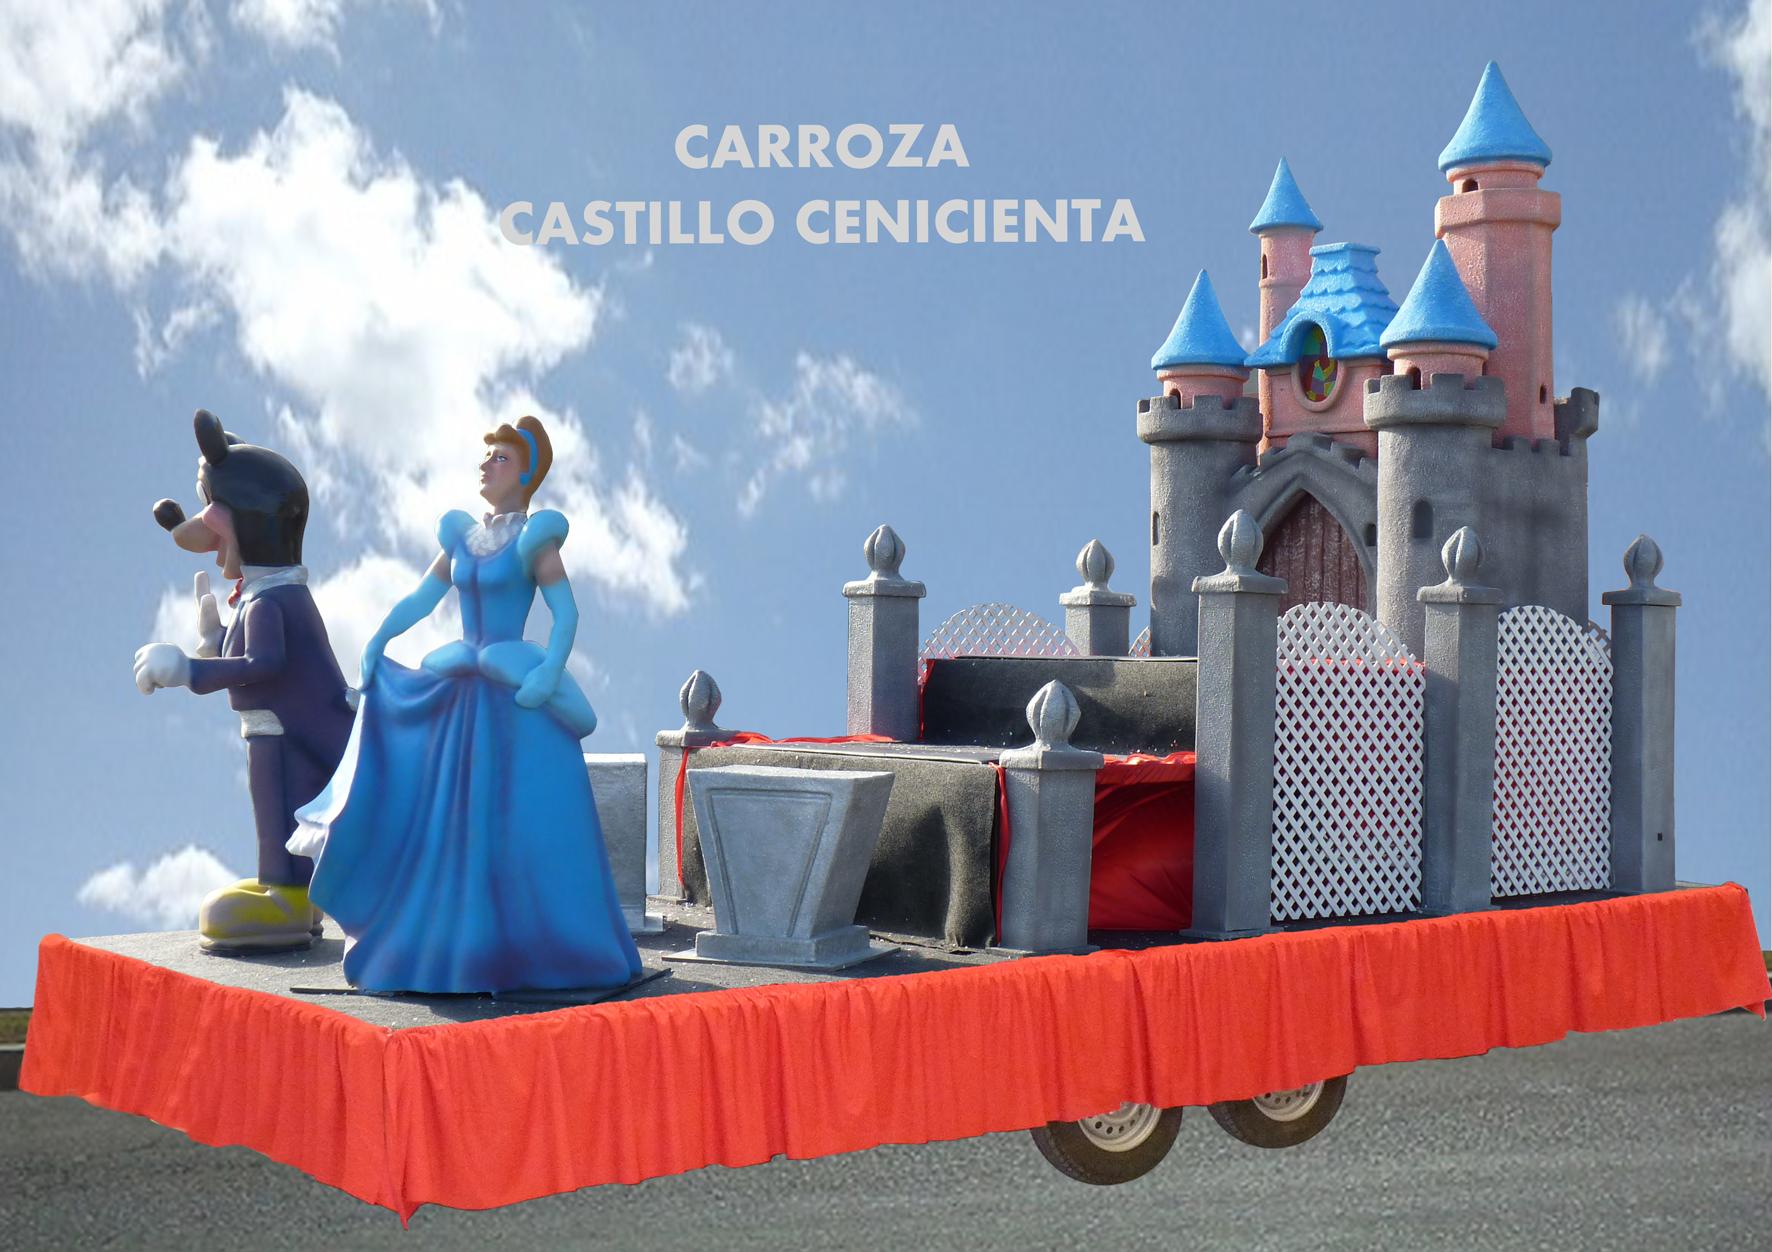 Carroza Infantil Cenicienta y Castillo